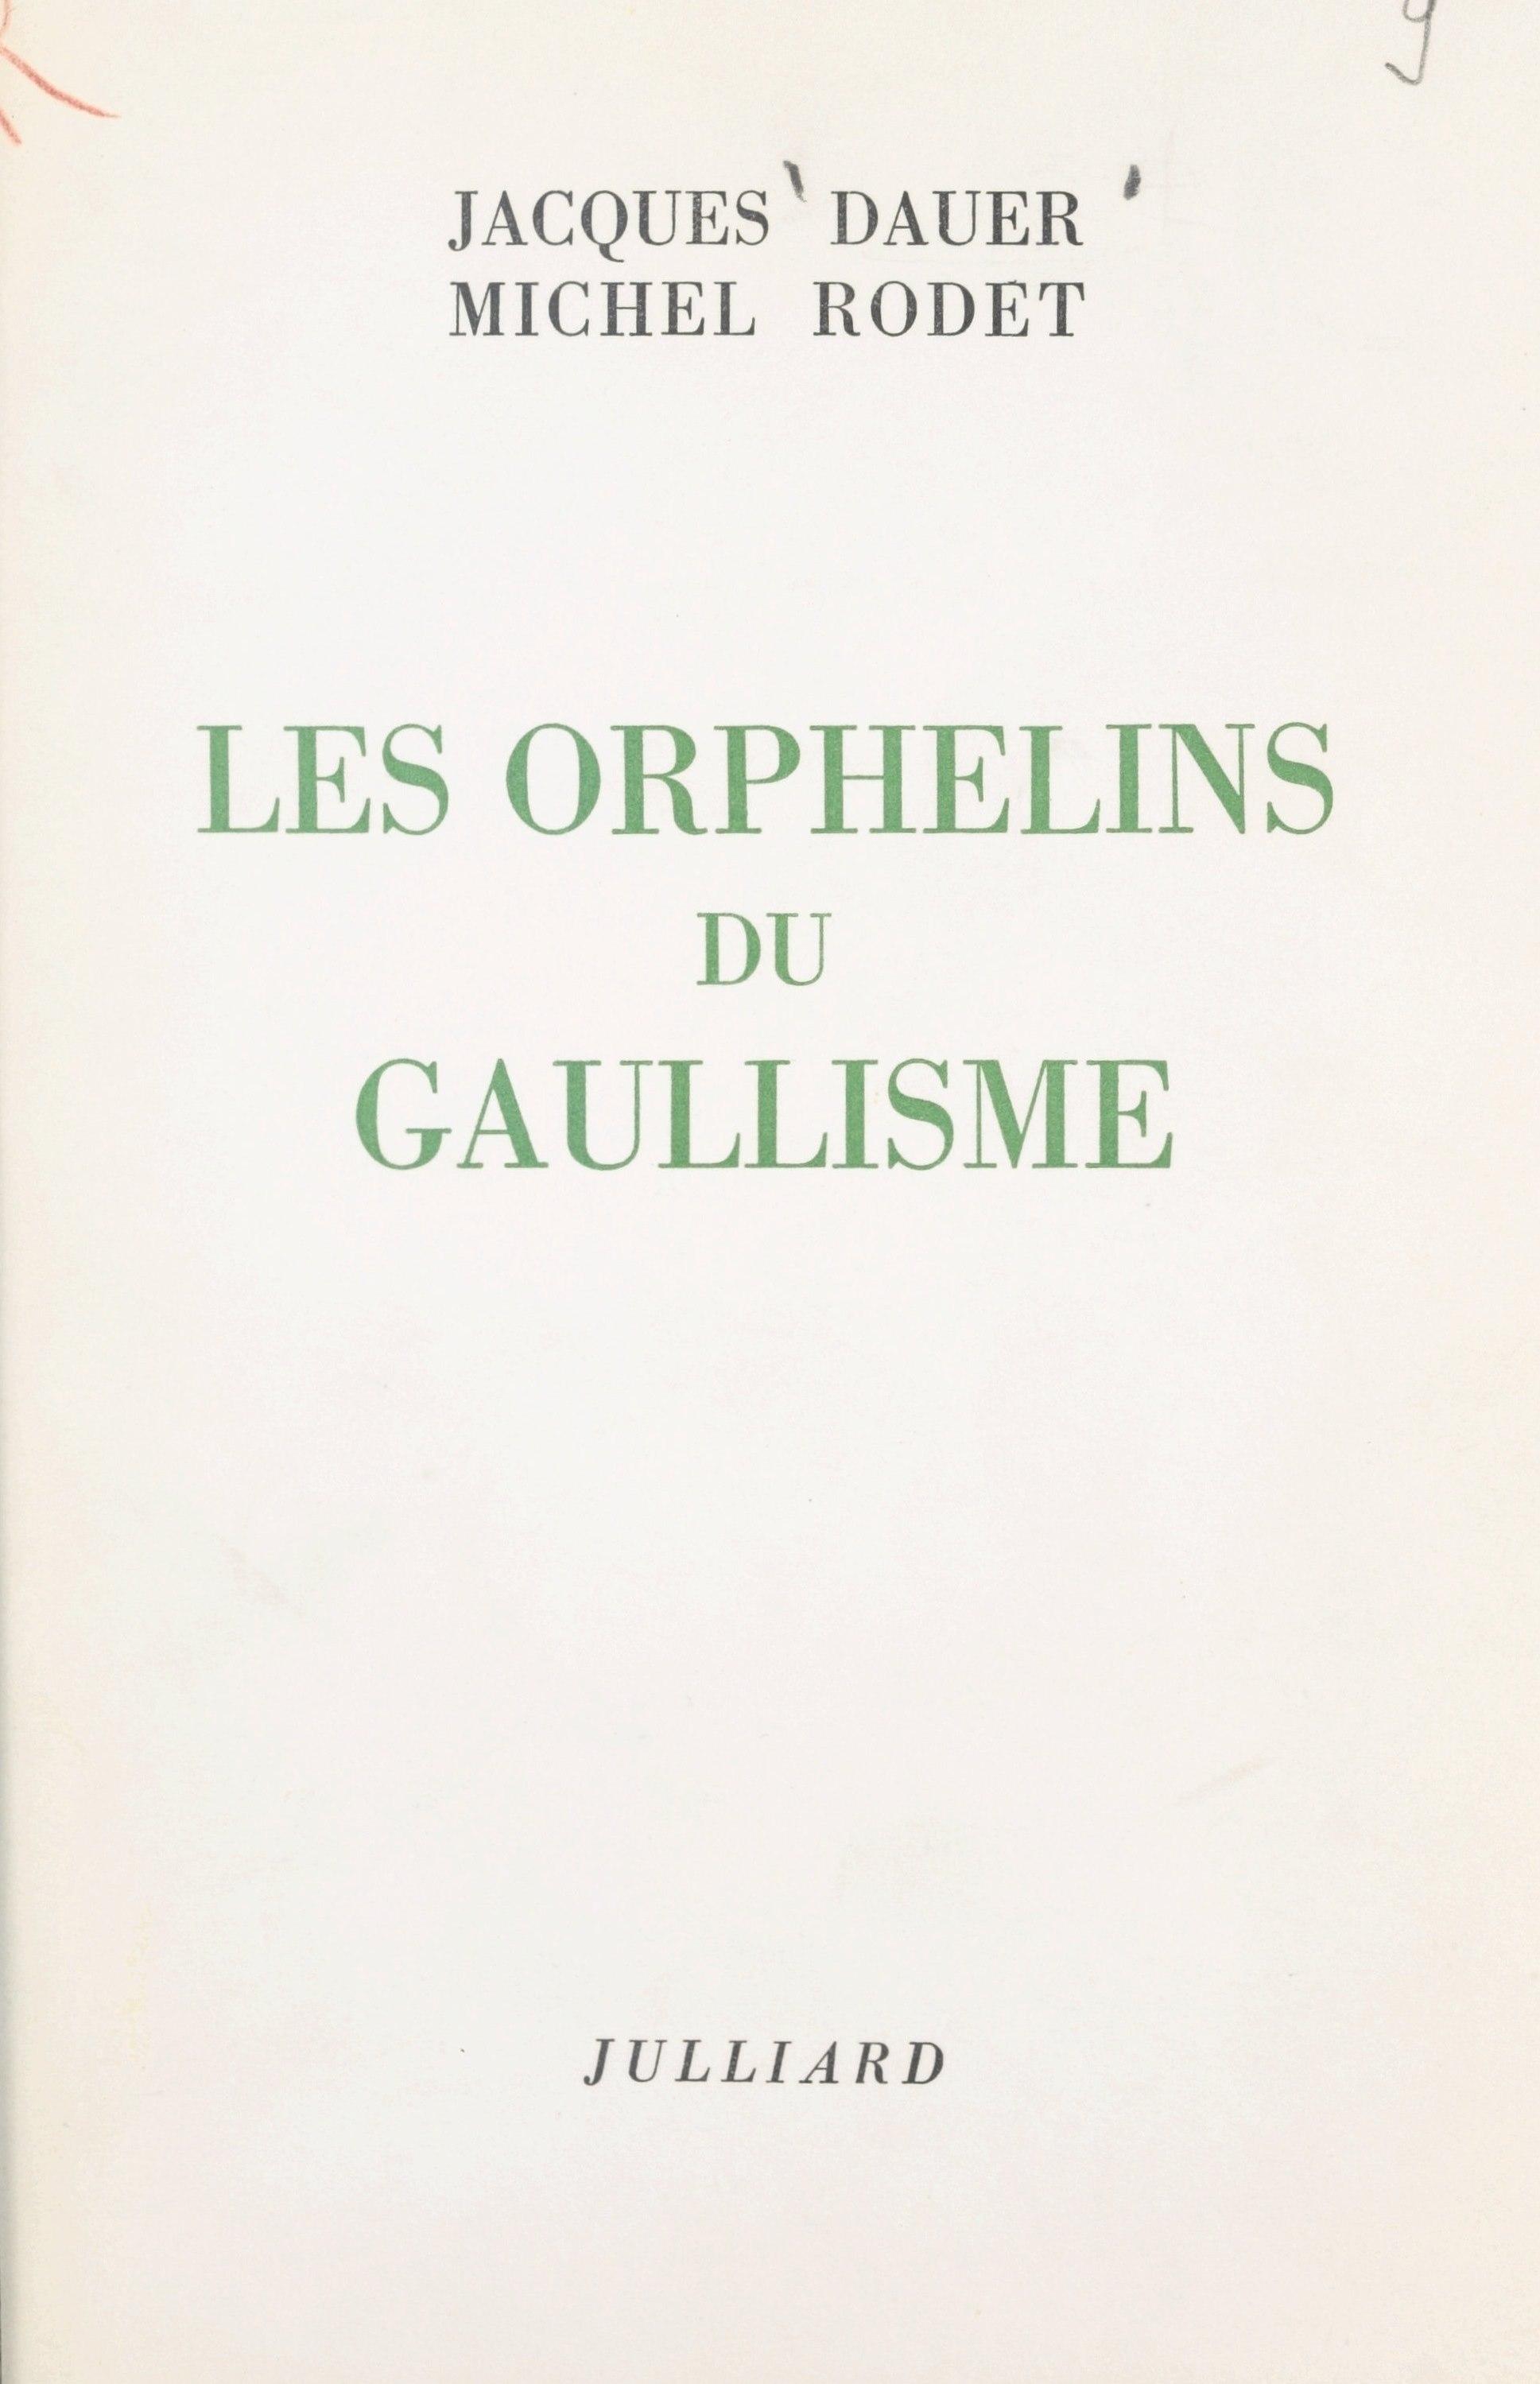 Les orphelins du gaullisme